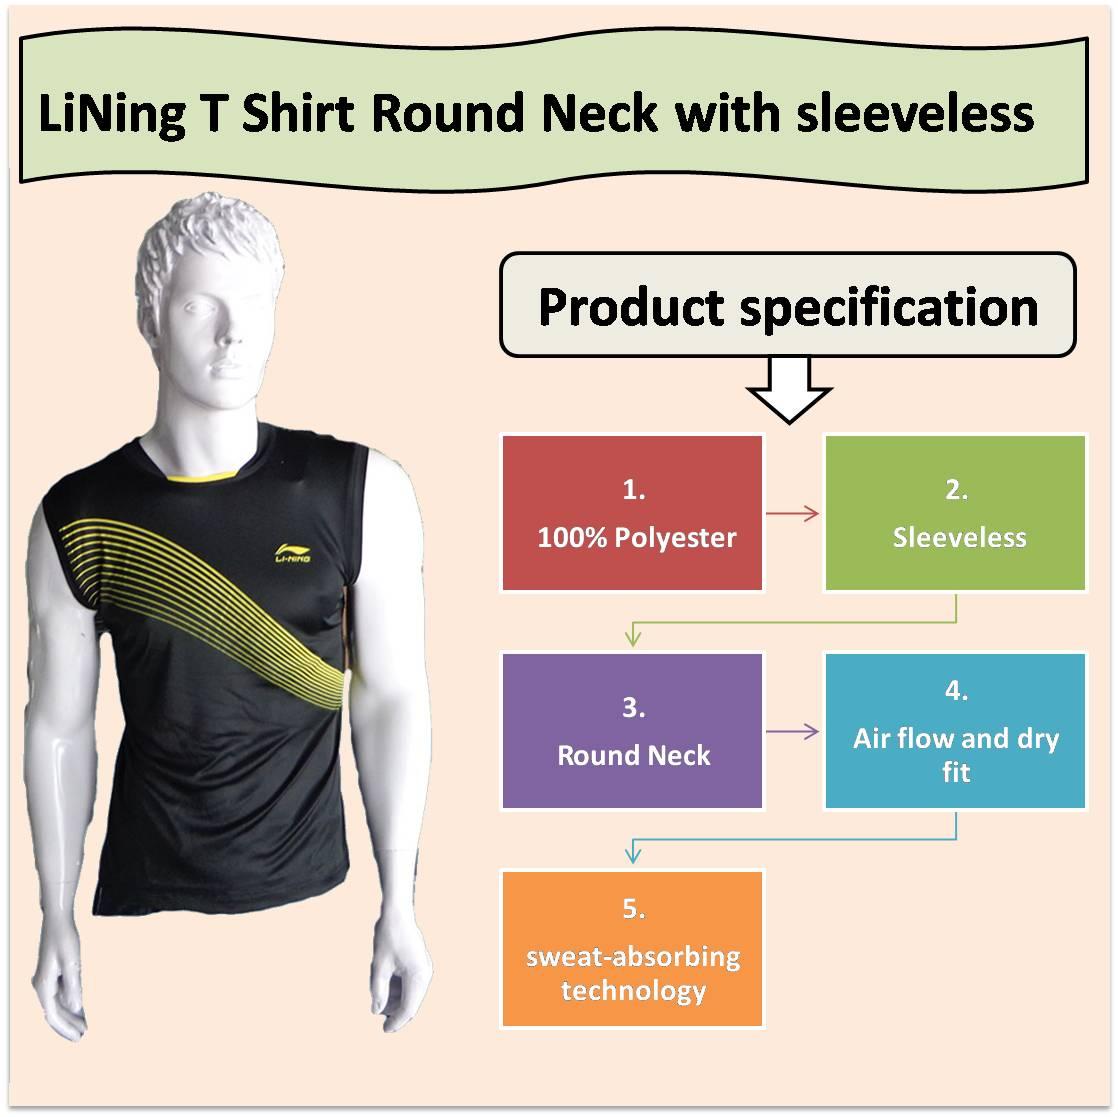 LiNing T Shirt Round Neck with sleeveless Black